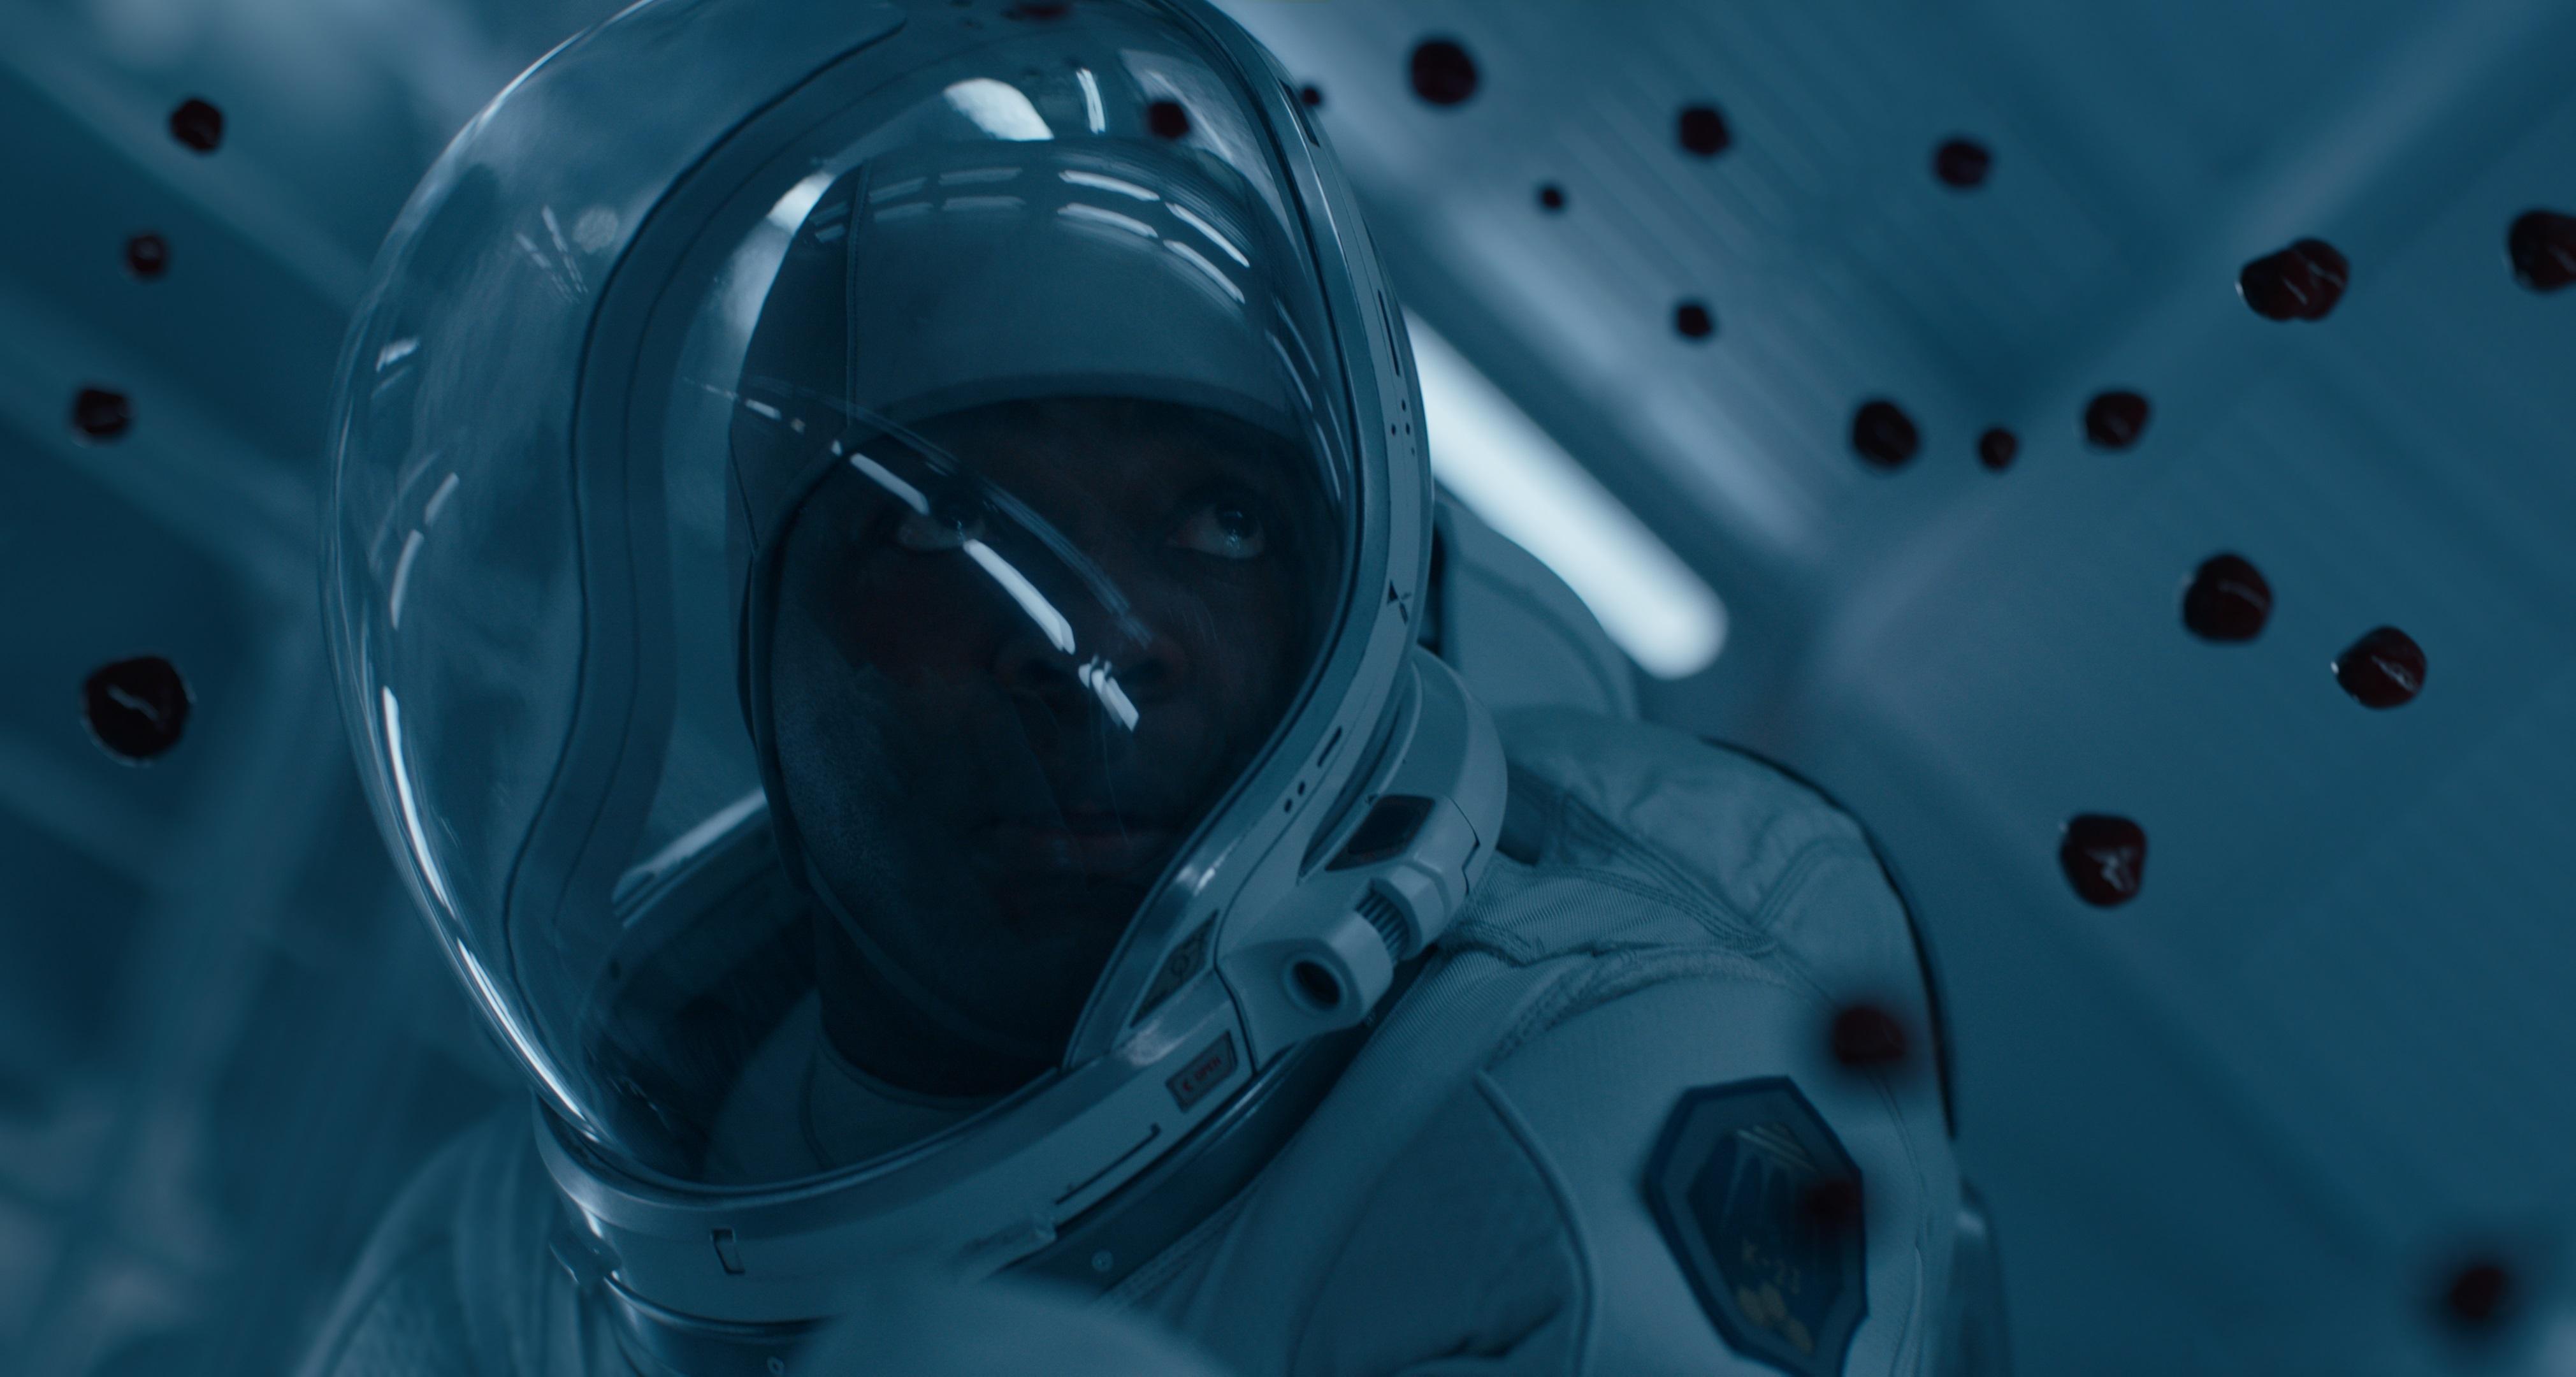 The Midnight Sky features impressive VFX work